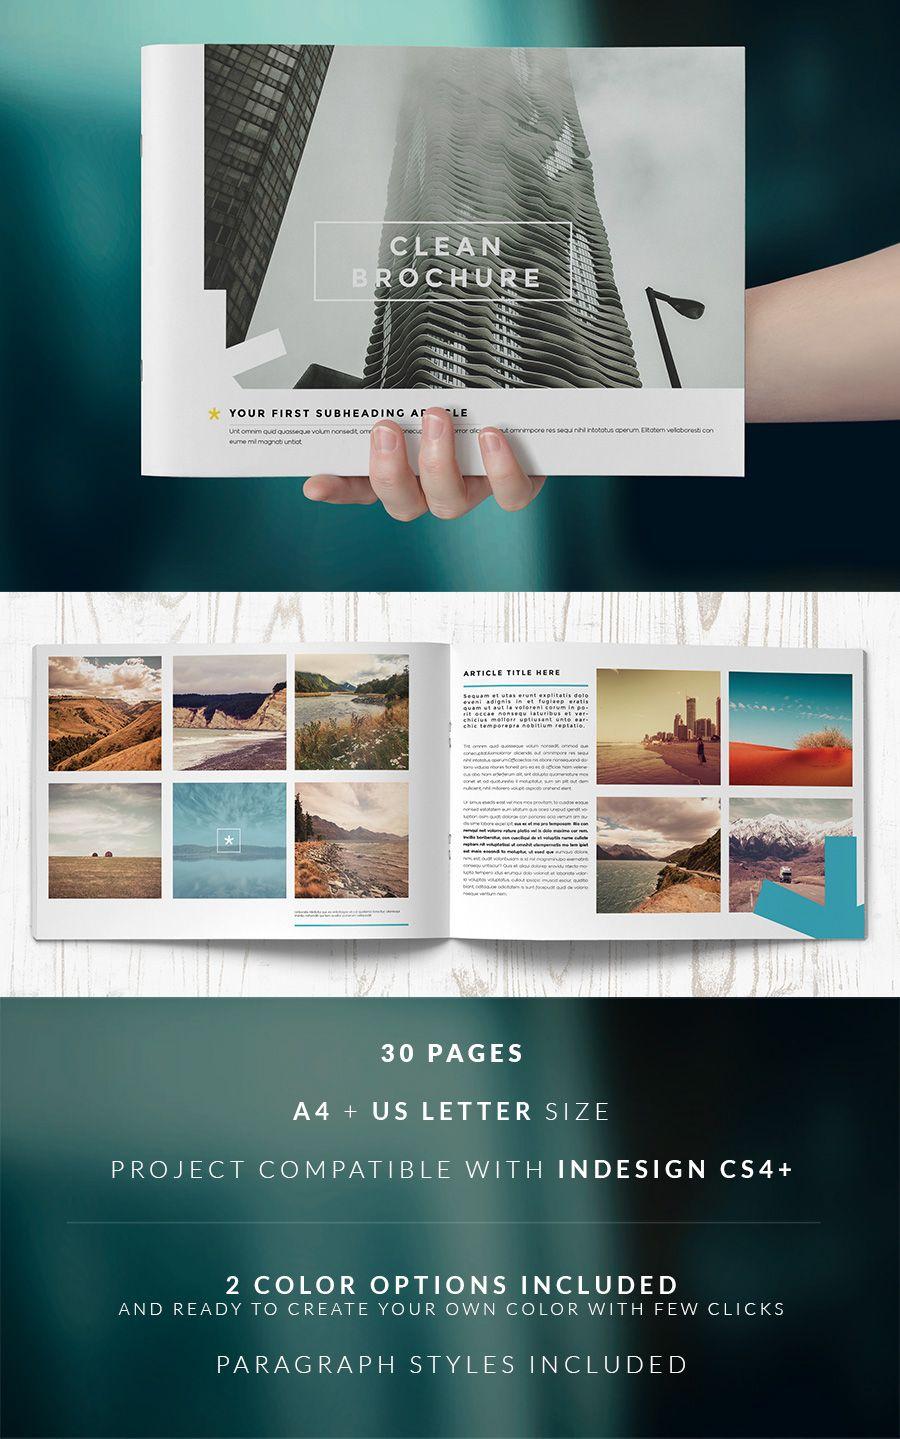 Clean Brochure / Catalog Template on Behance